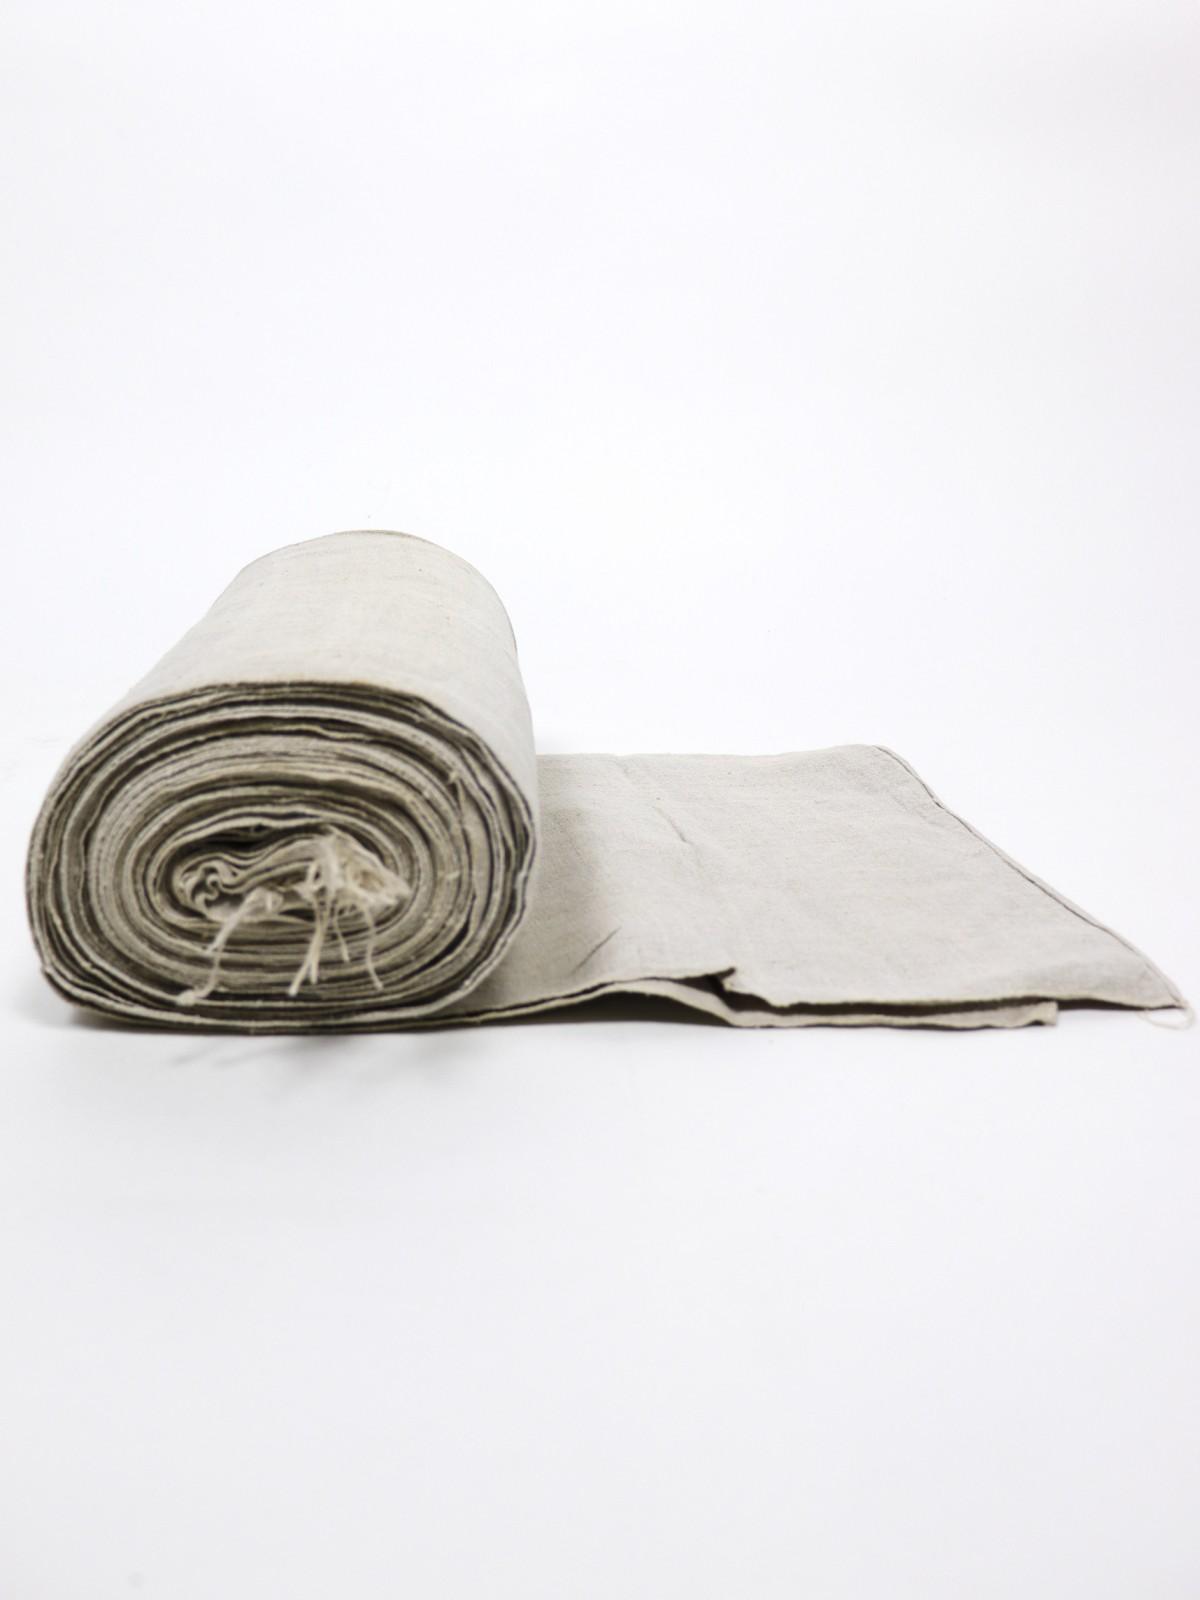 Ukraine fabric,Linenfabric,